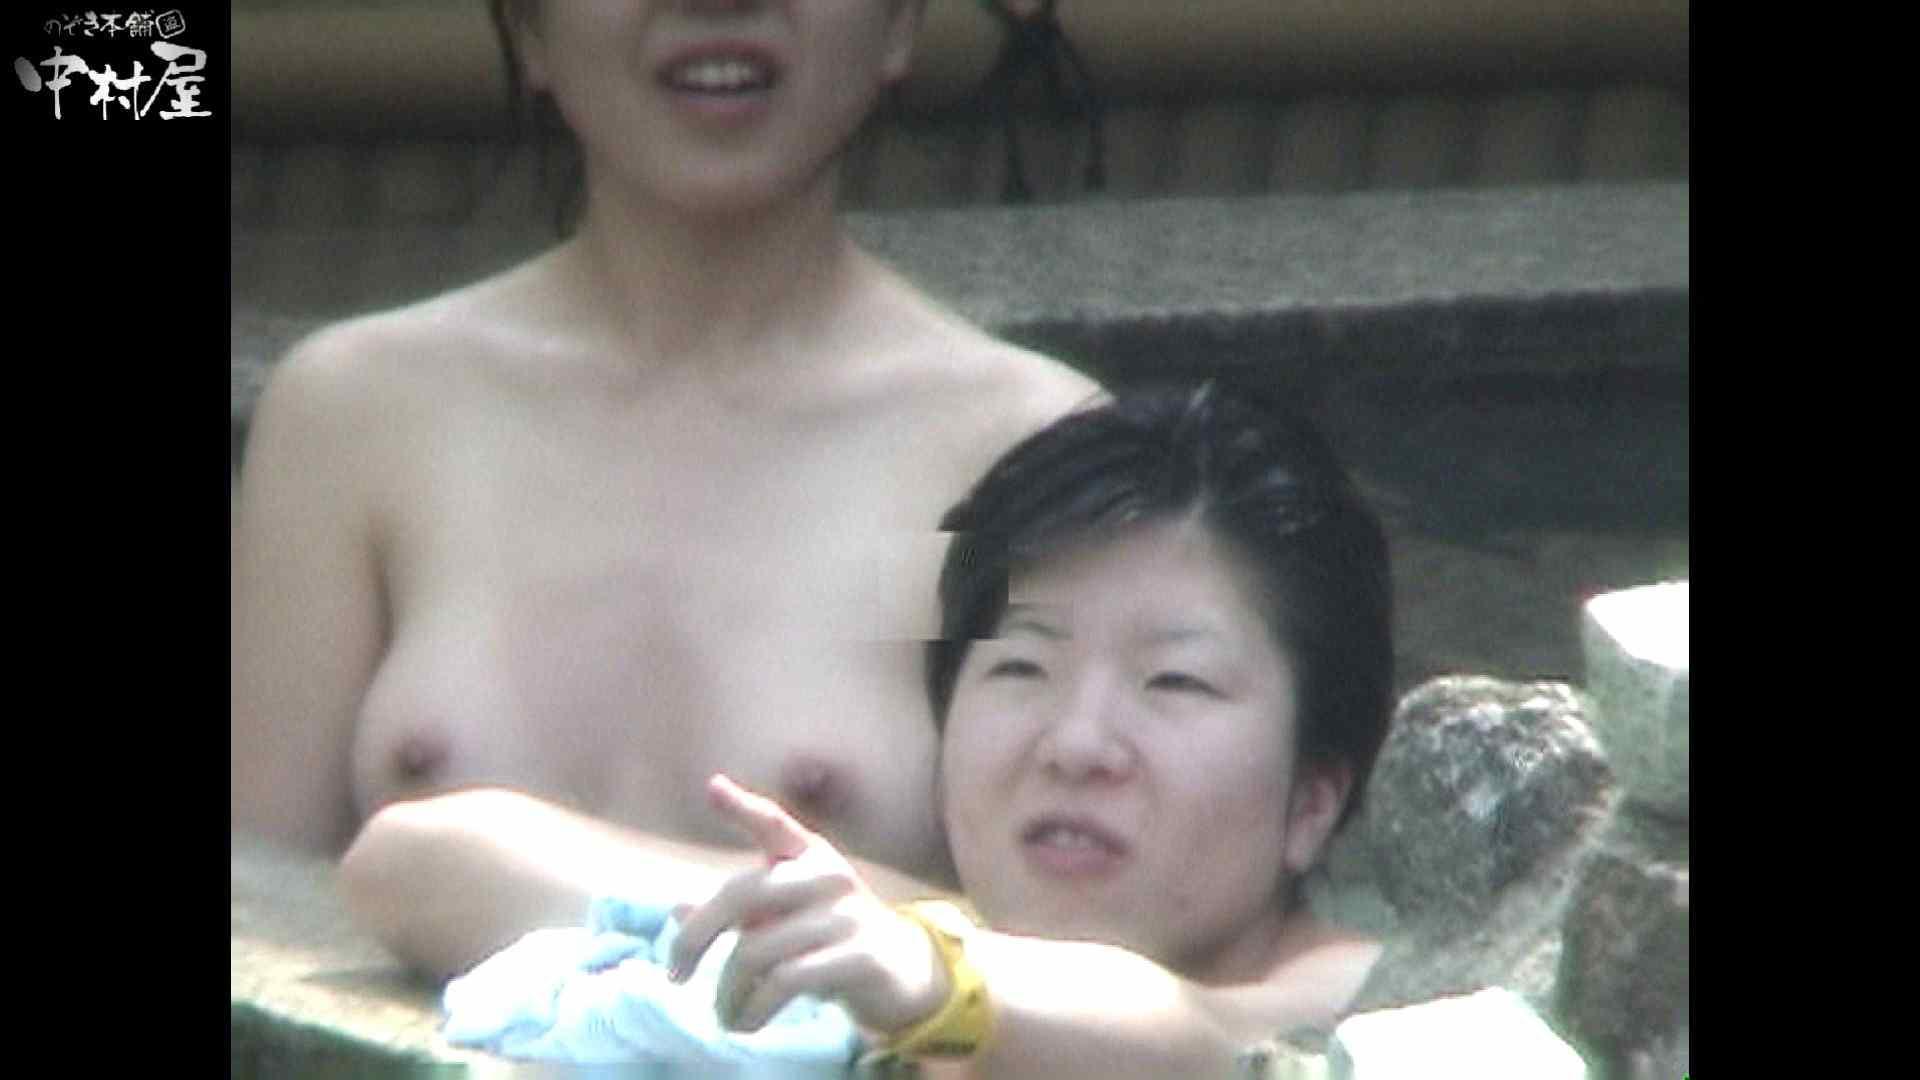 Aquaな露天風呂Vol.936 盗撮映像  110Pix 17